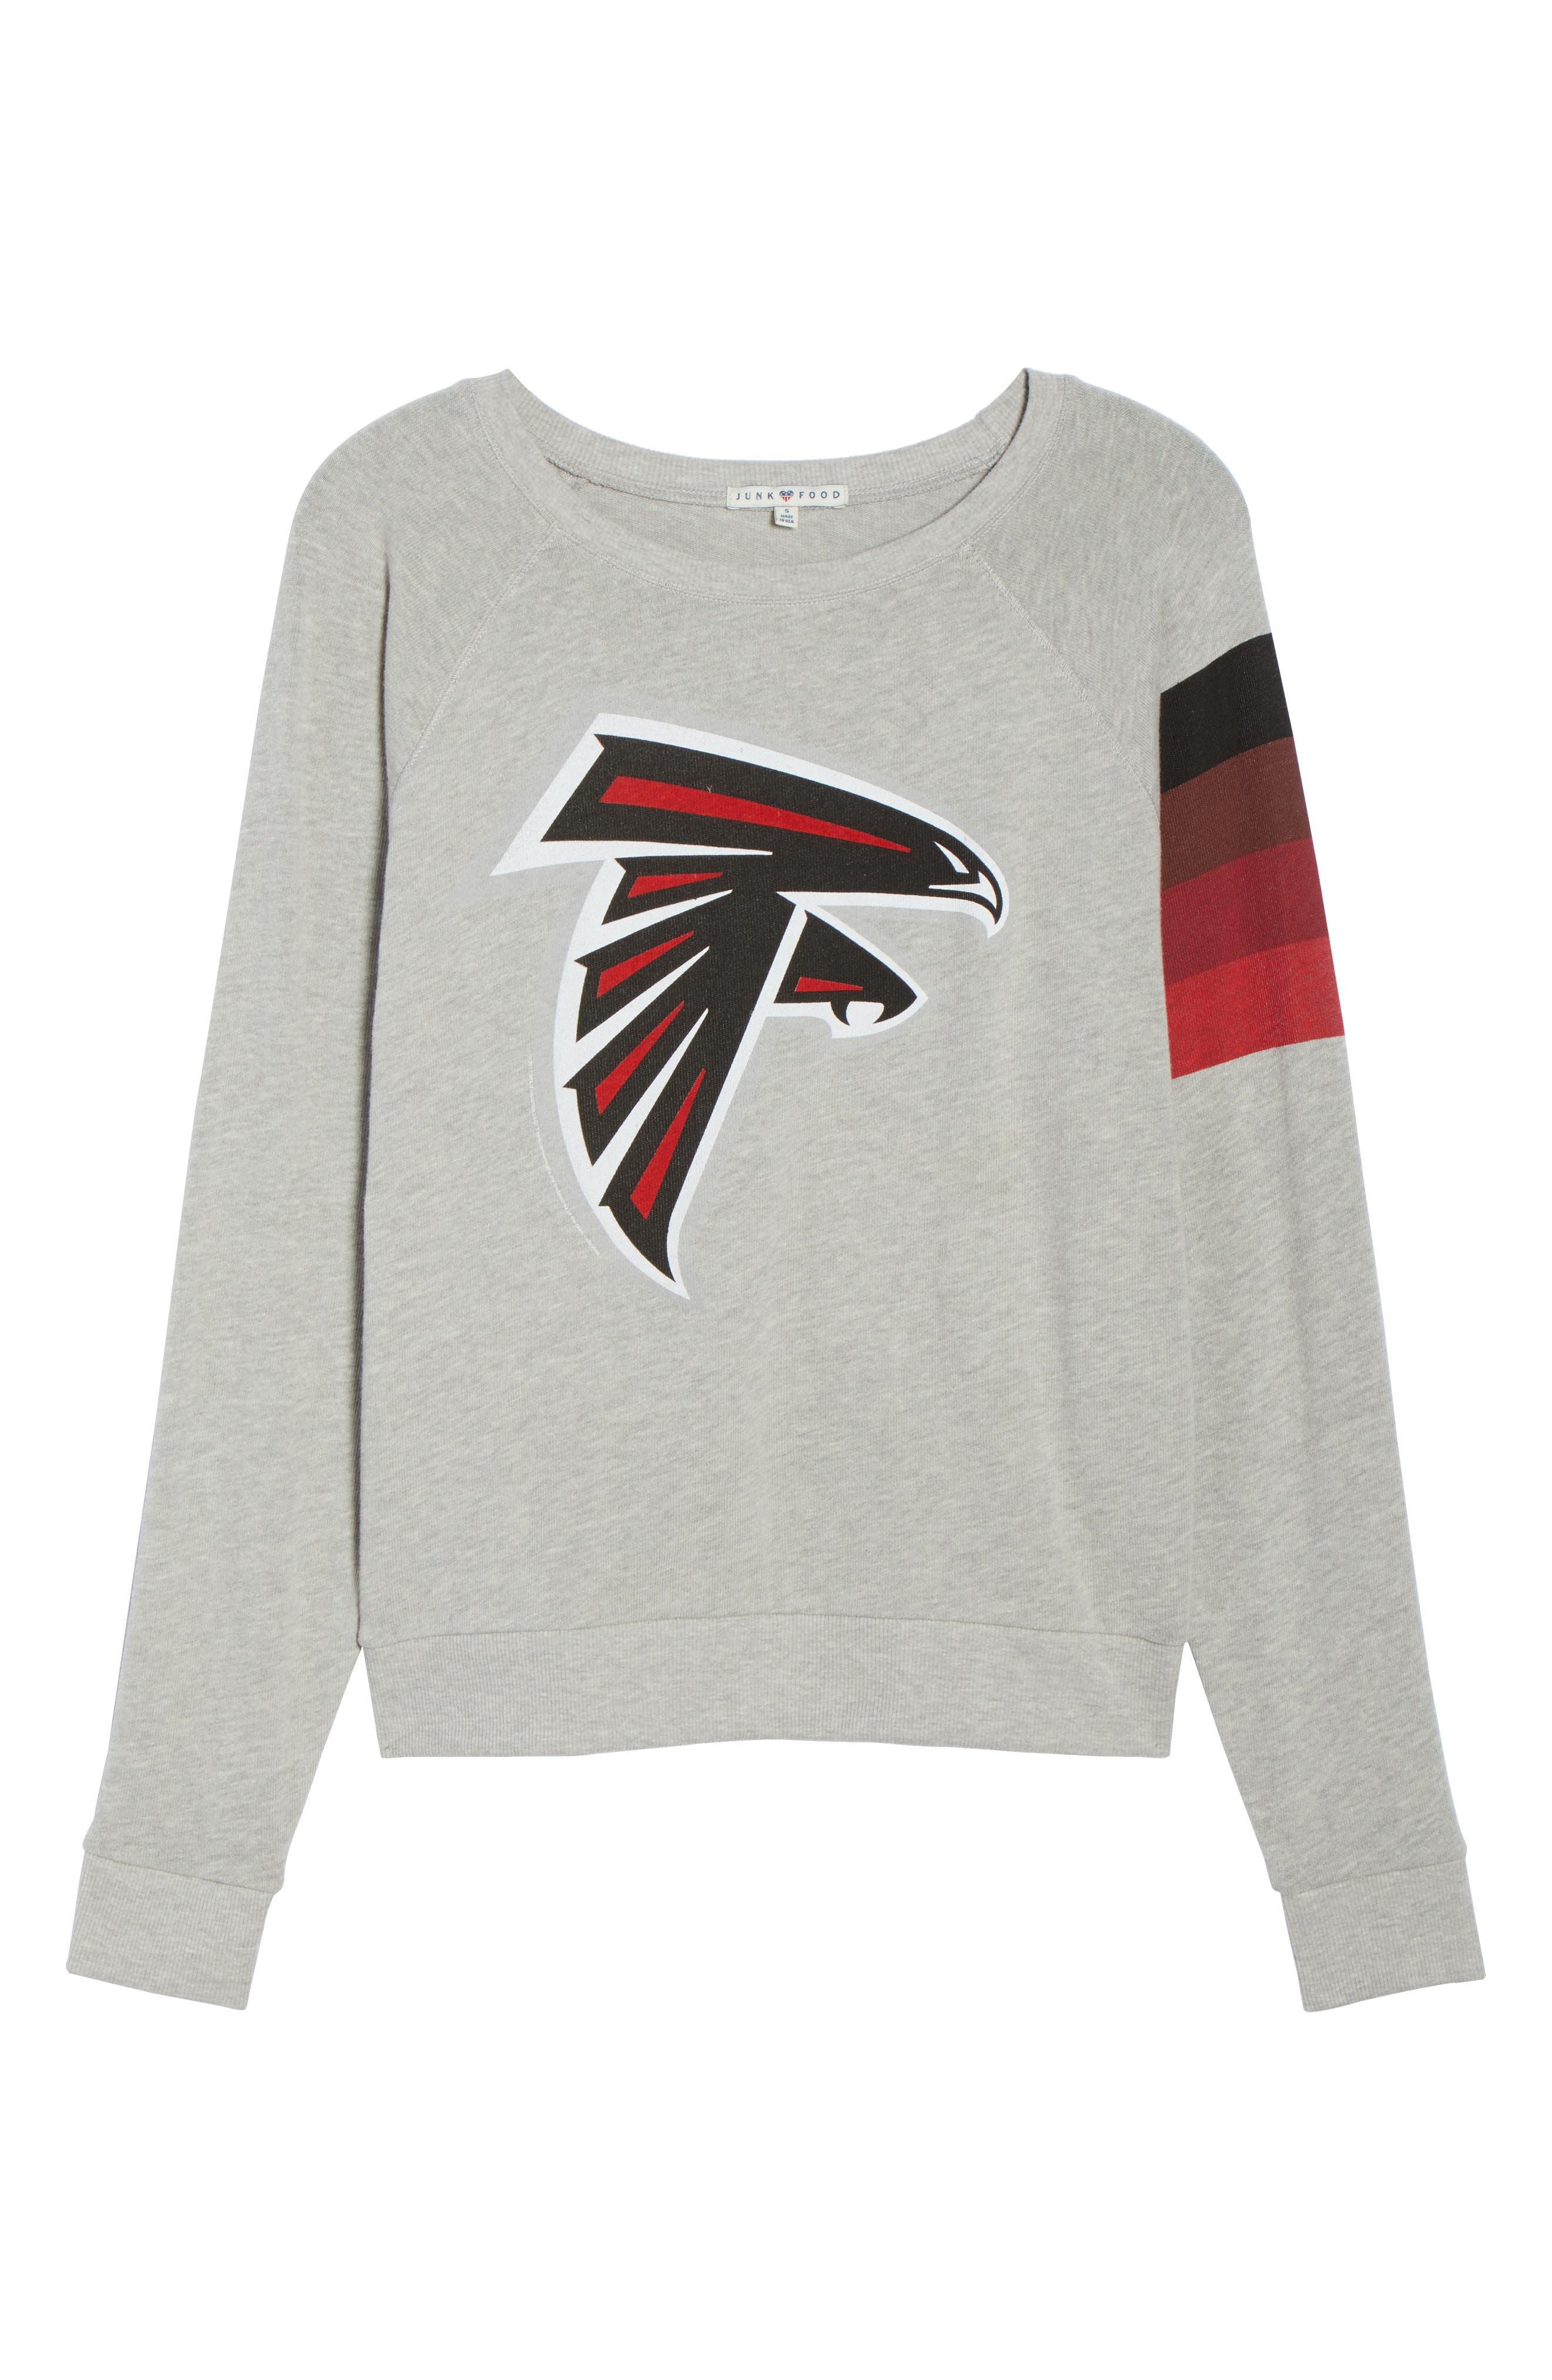 NFL Atlanta Falcons Hacci Sweatshirt,                             Alternate thumbnail 7, color,                             Dove Heather Grey